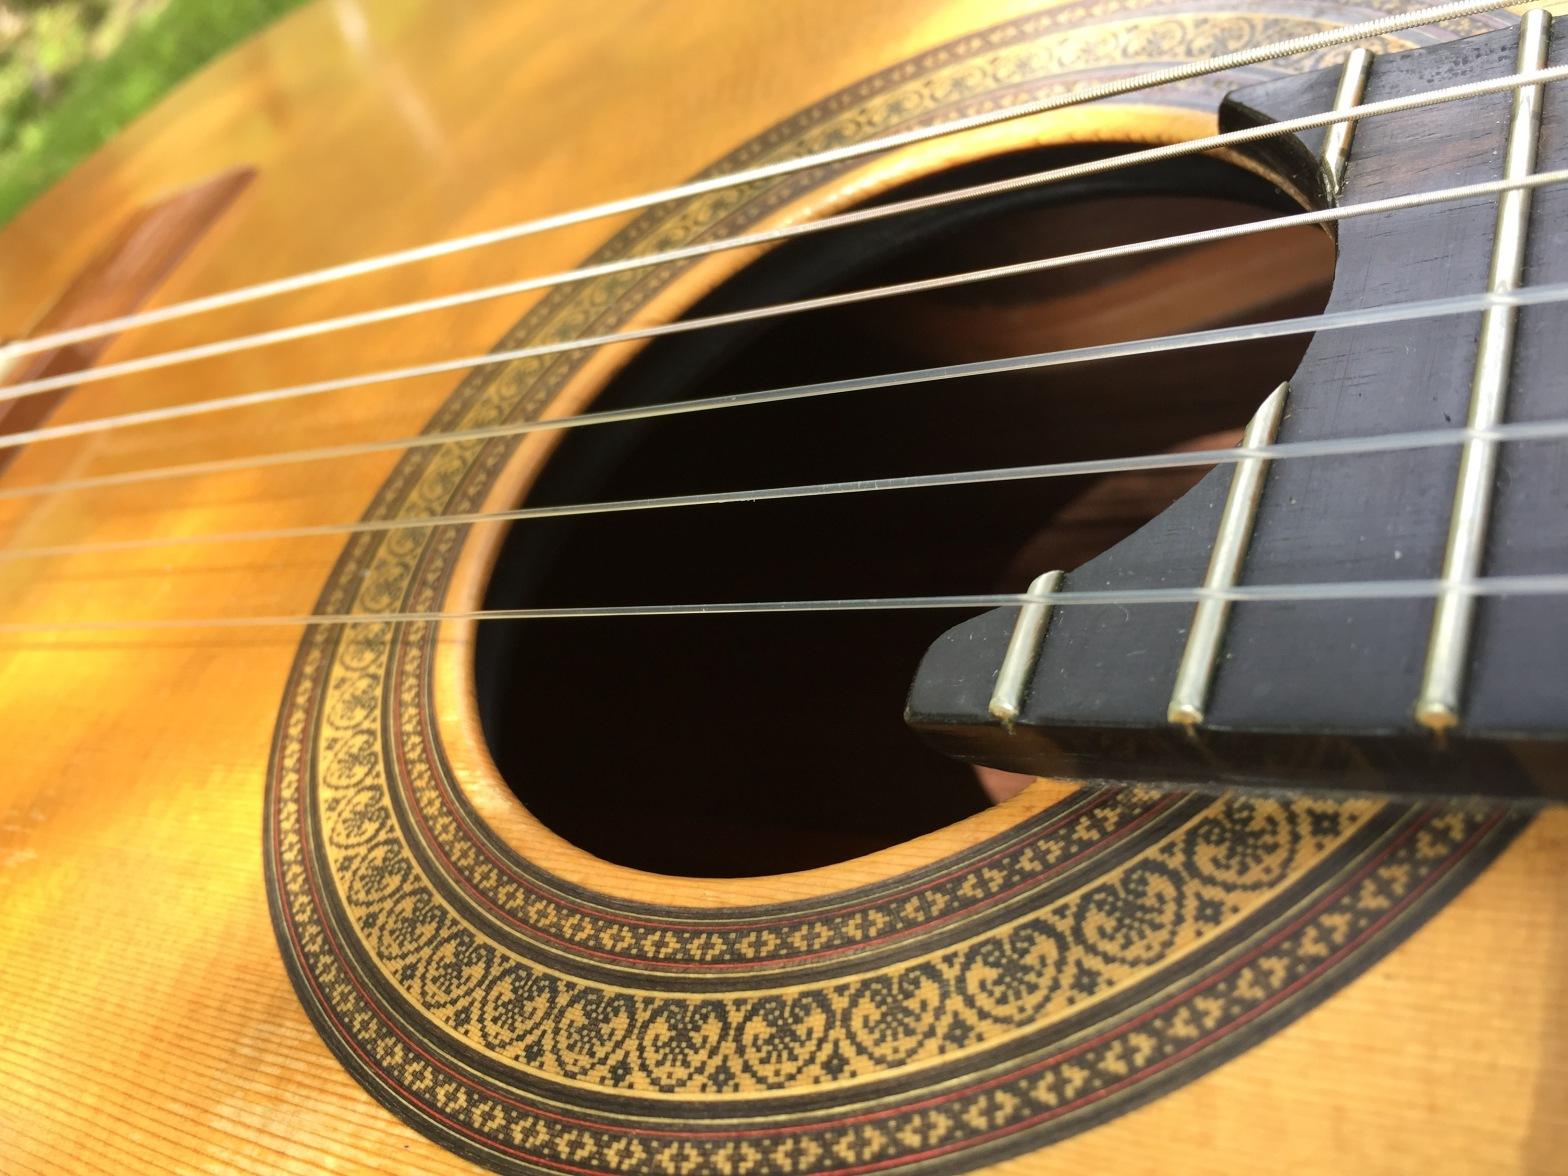 Nylon stringed guitar close up